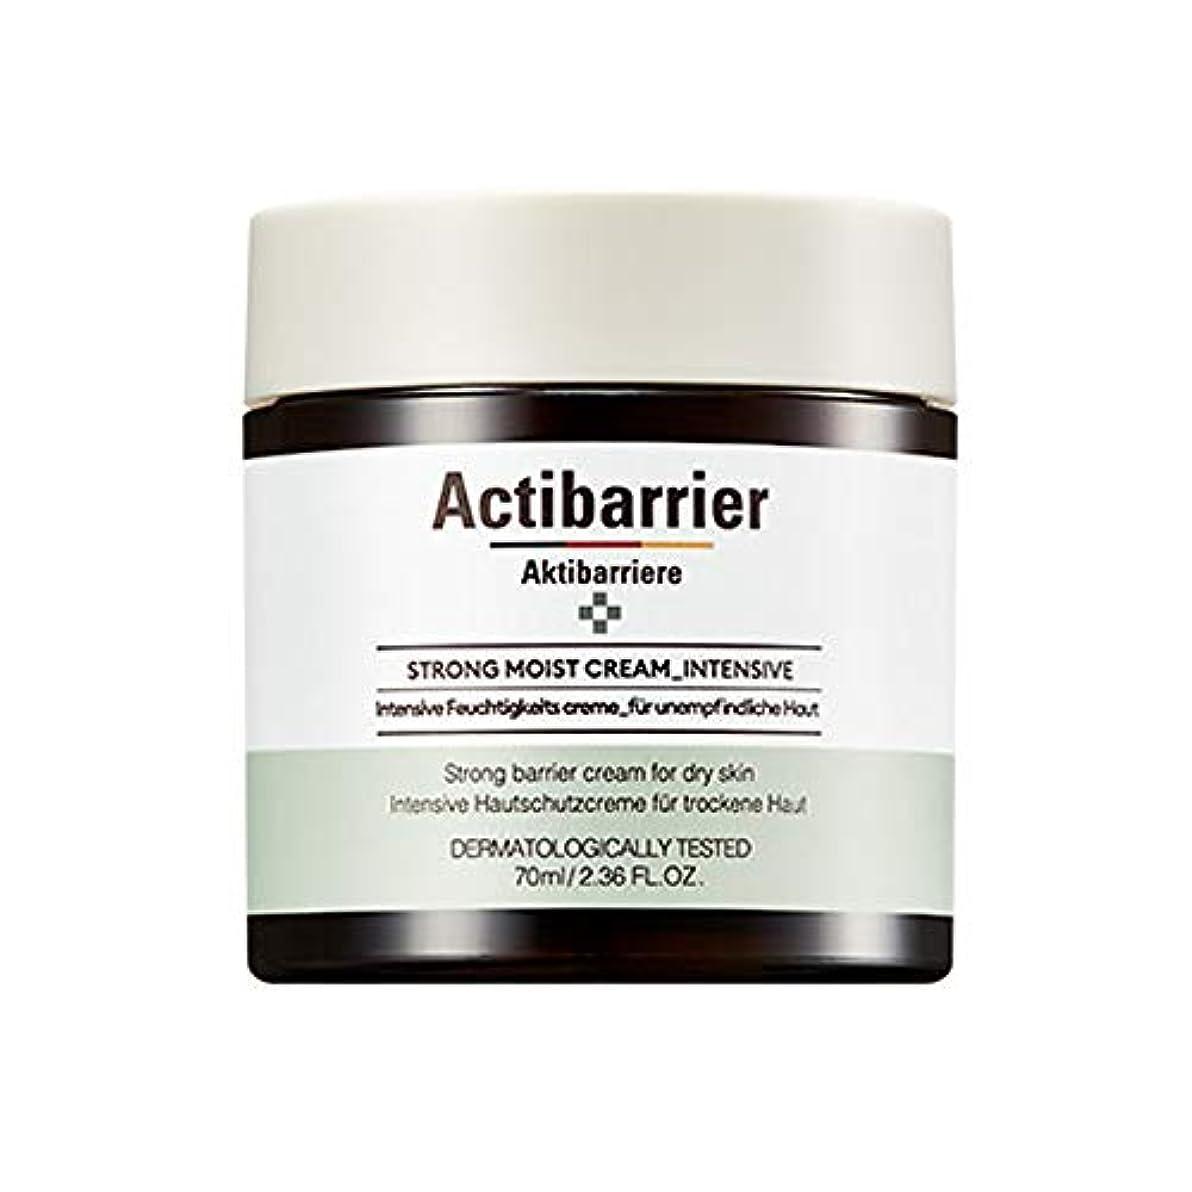 Actibarrier Strong Moist Cream_Intensiveアクチバリアストロングモイストクリーム_インテンシブ [並行輸入品]